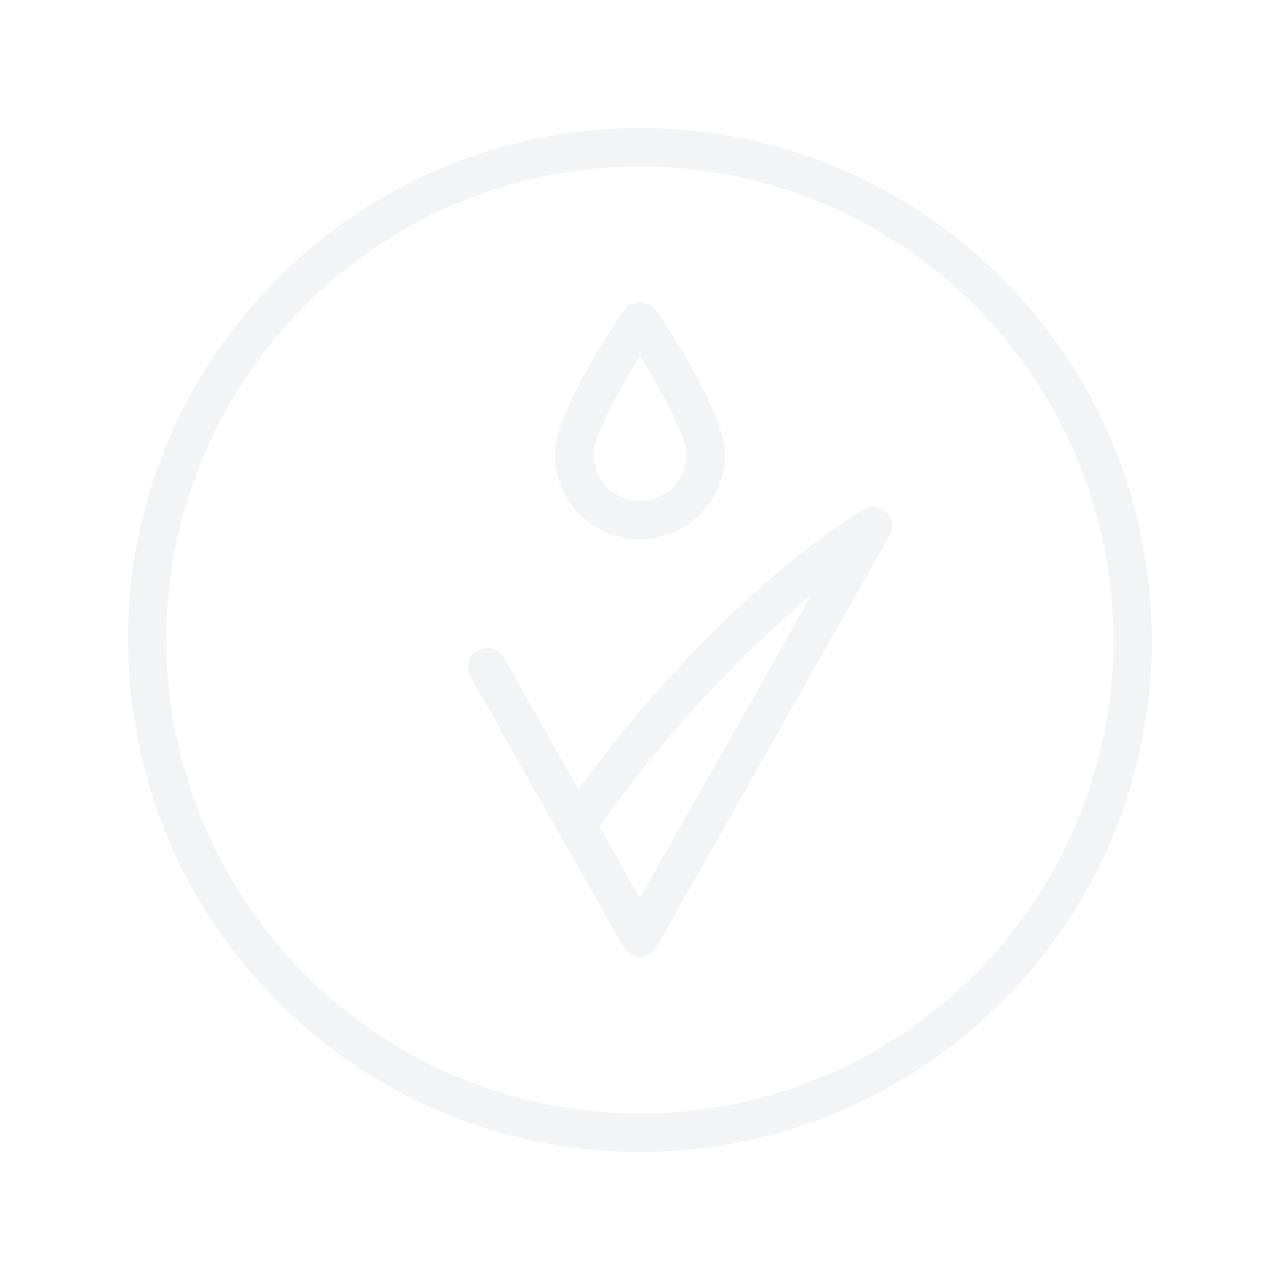 SAMPURE MINERALS Cosmetic Bag